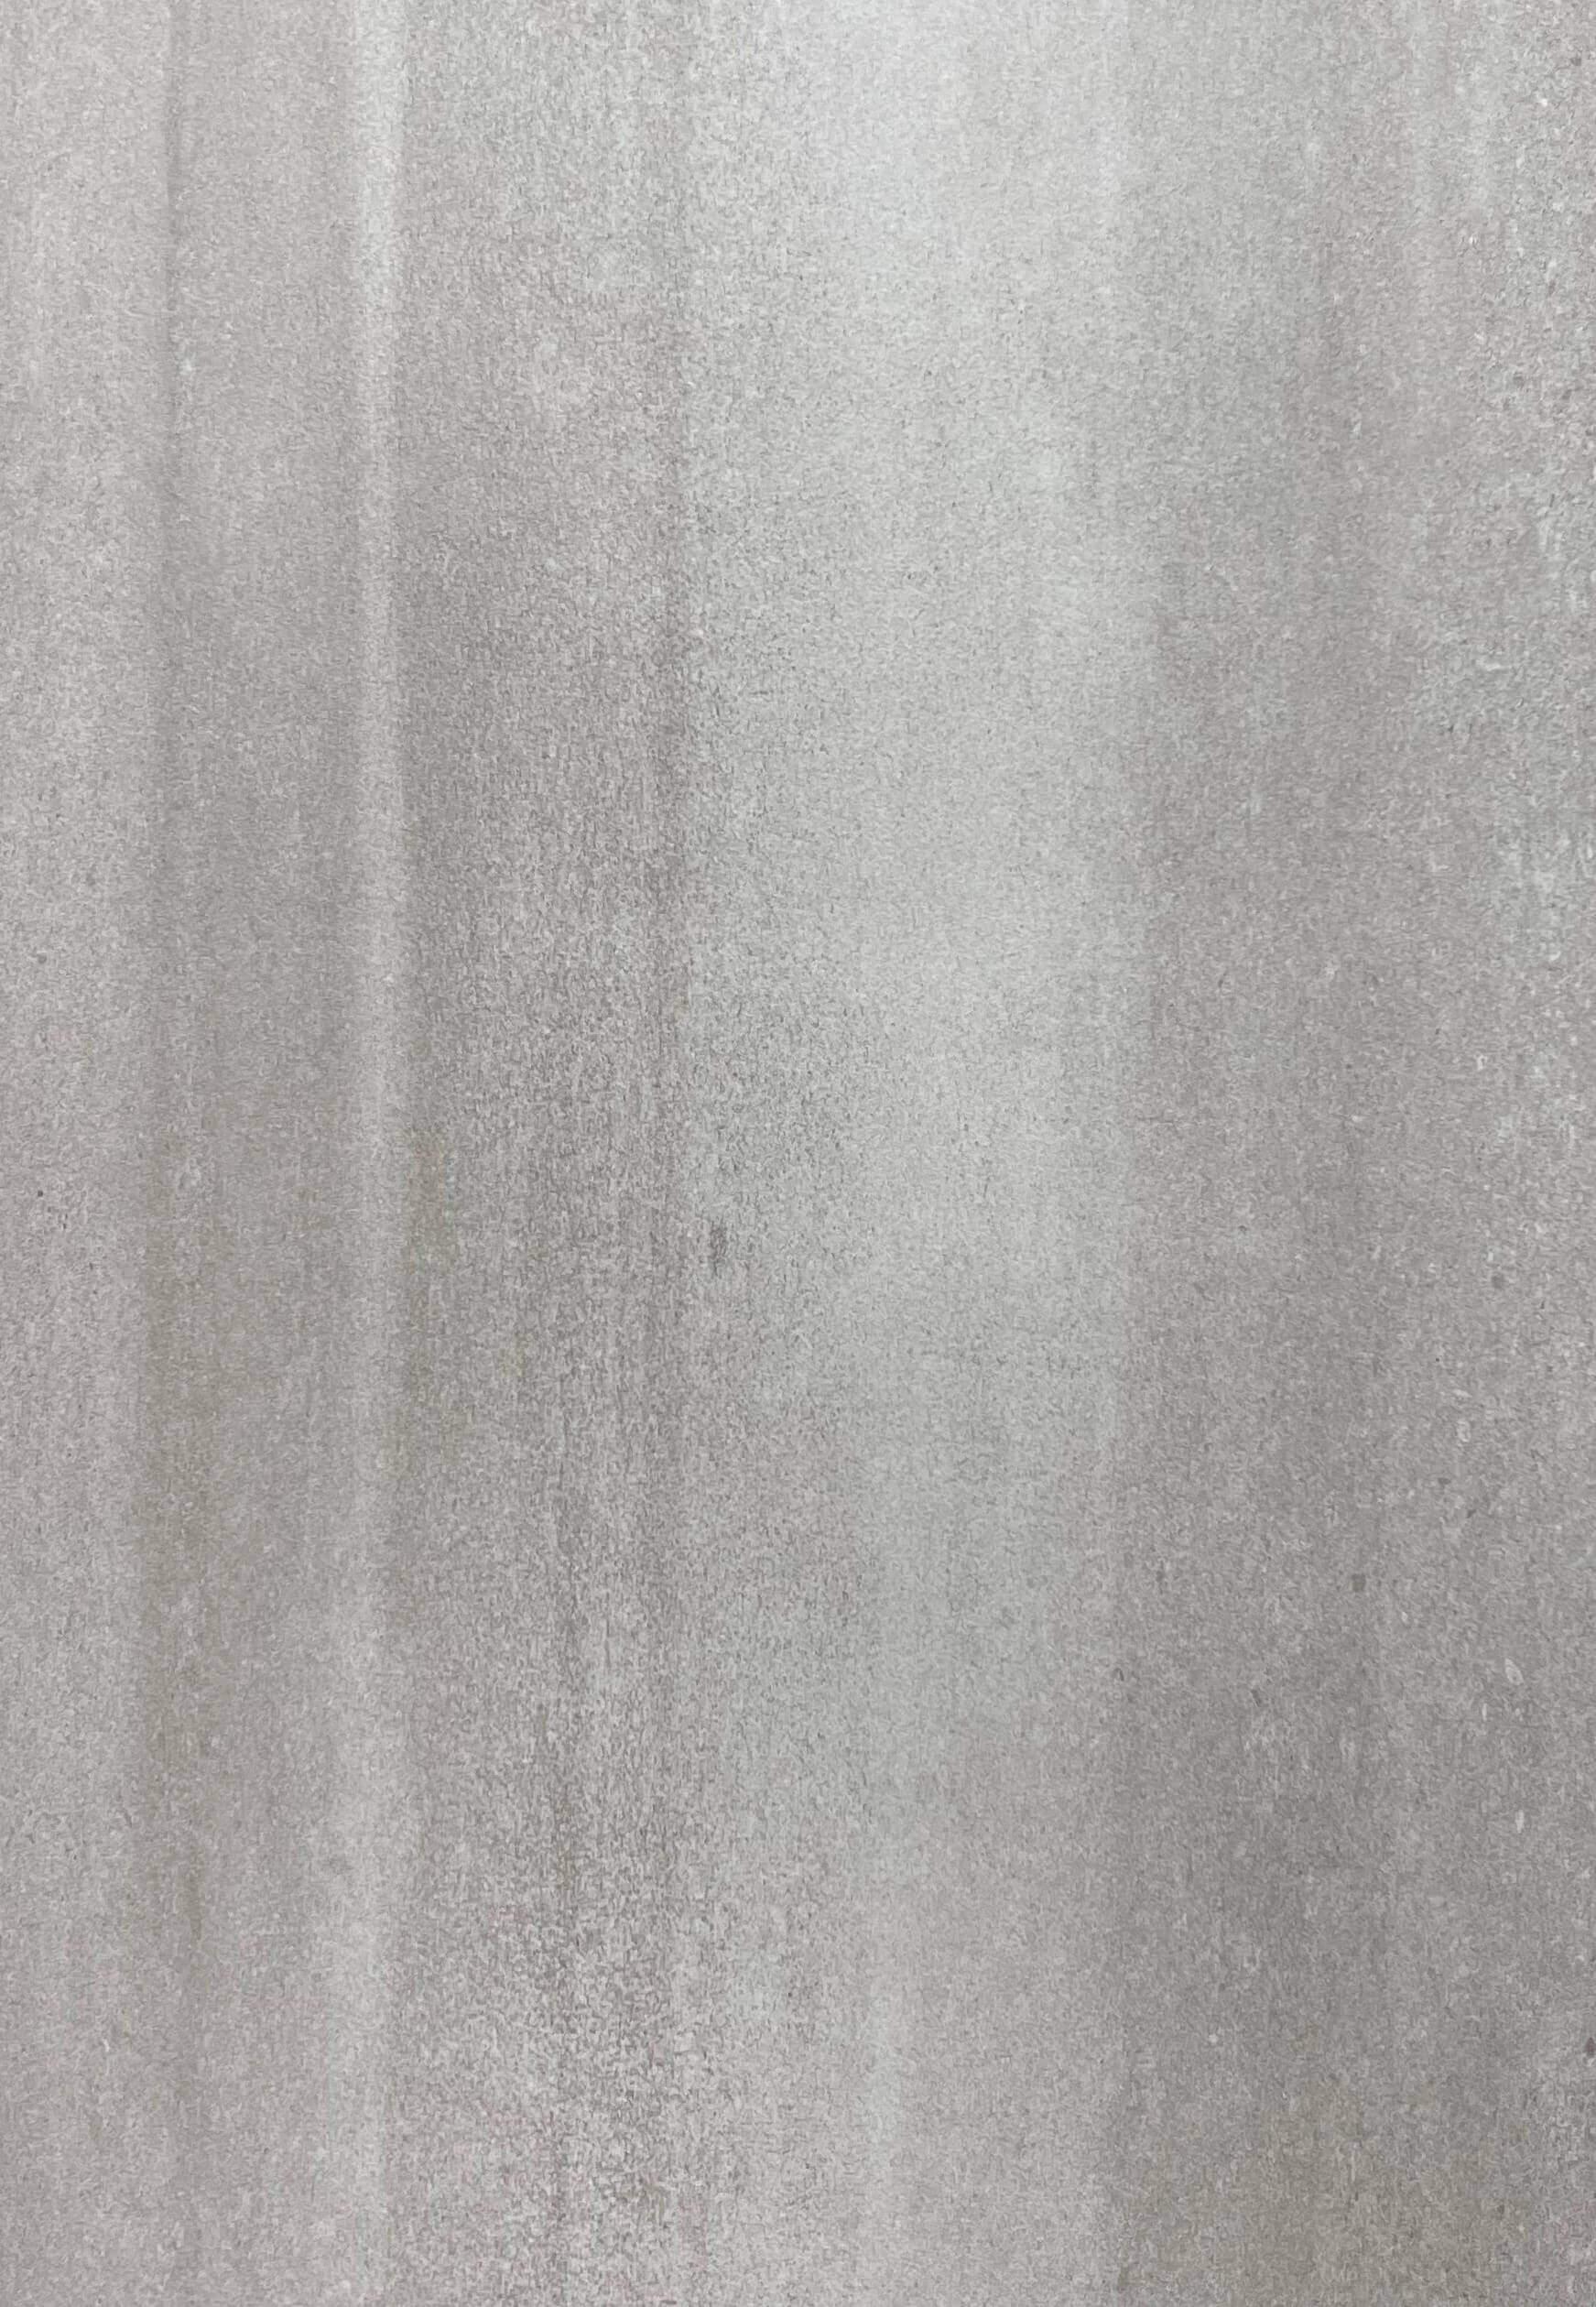 Mid Grey Brushed Concrete Look Matt Rectified Porcelain Tile 3882